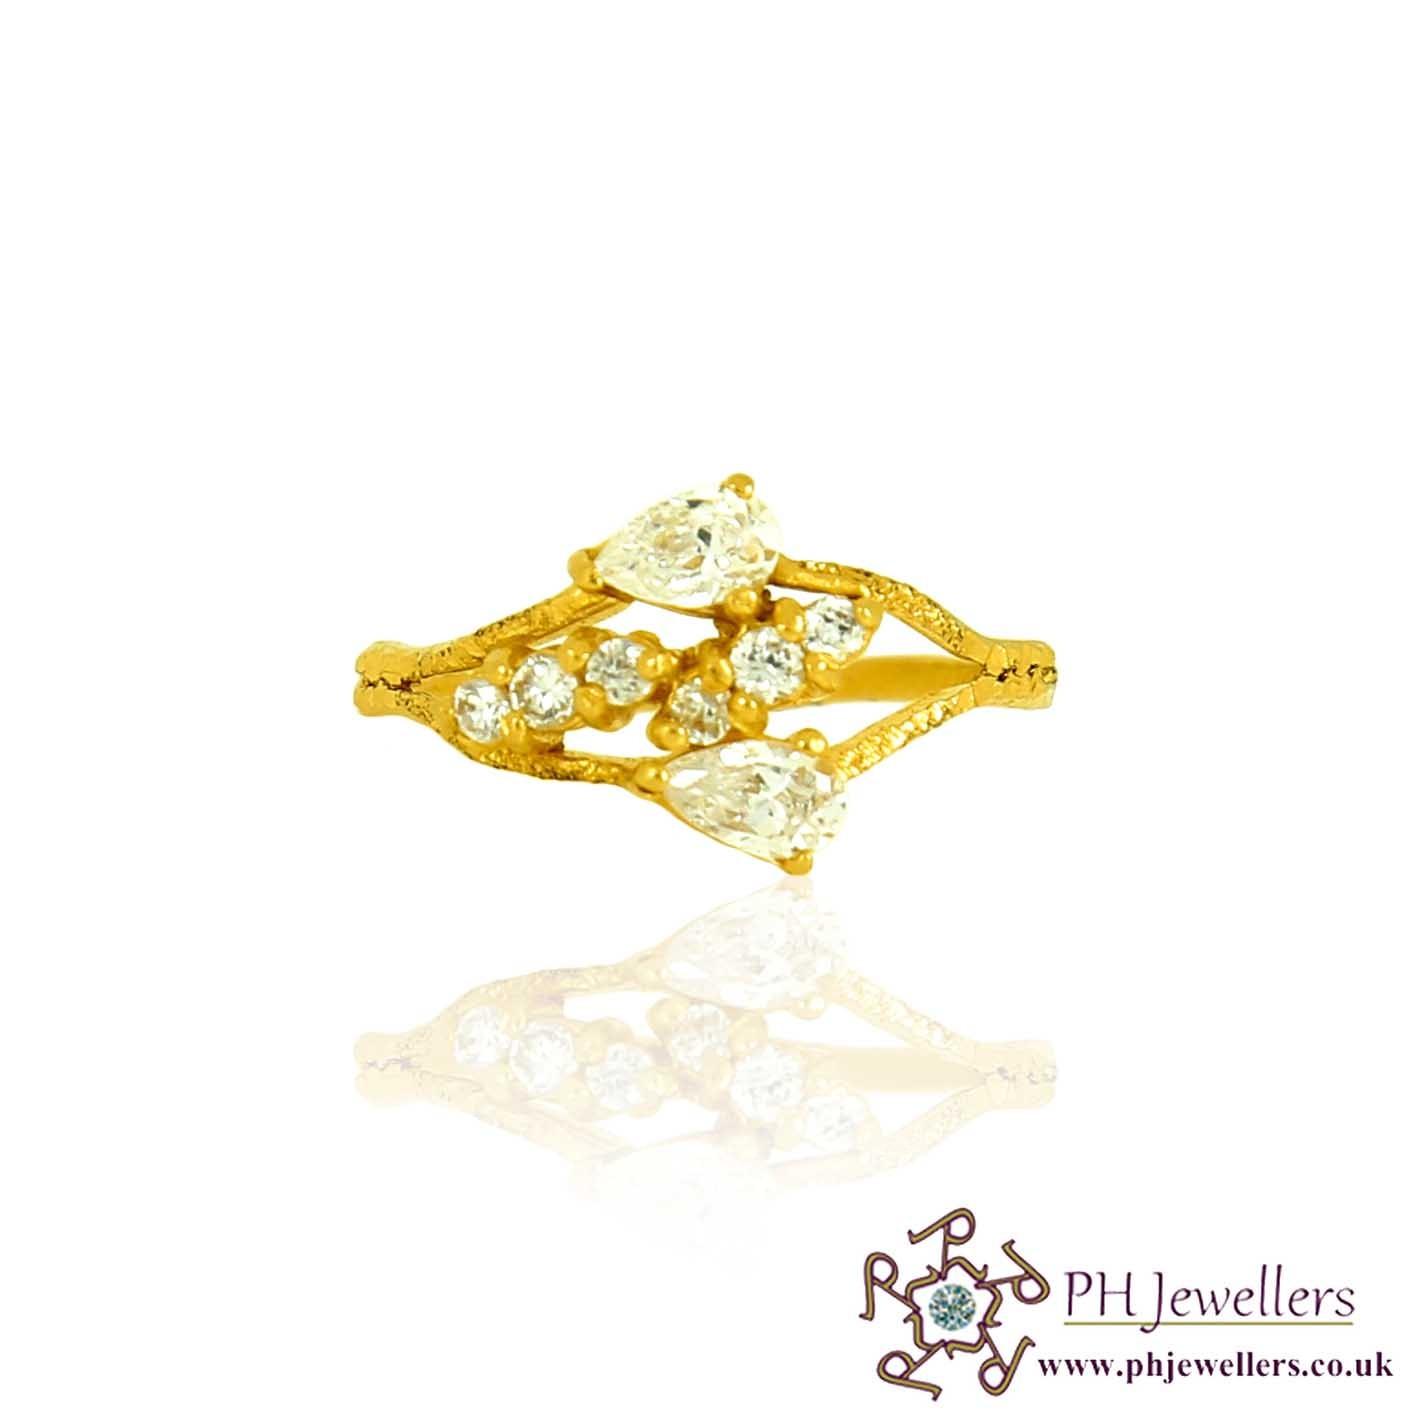 22ct 916 Hallmark Yellow Gold Size L1/2,M Ring CZ SR80